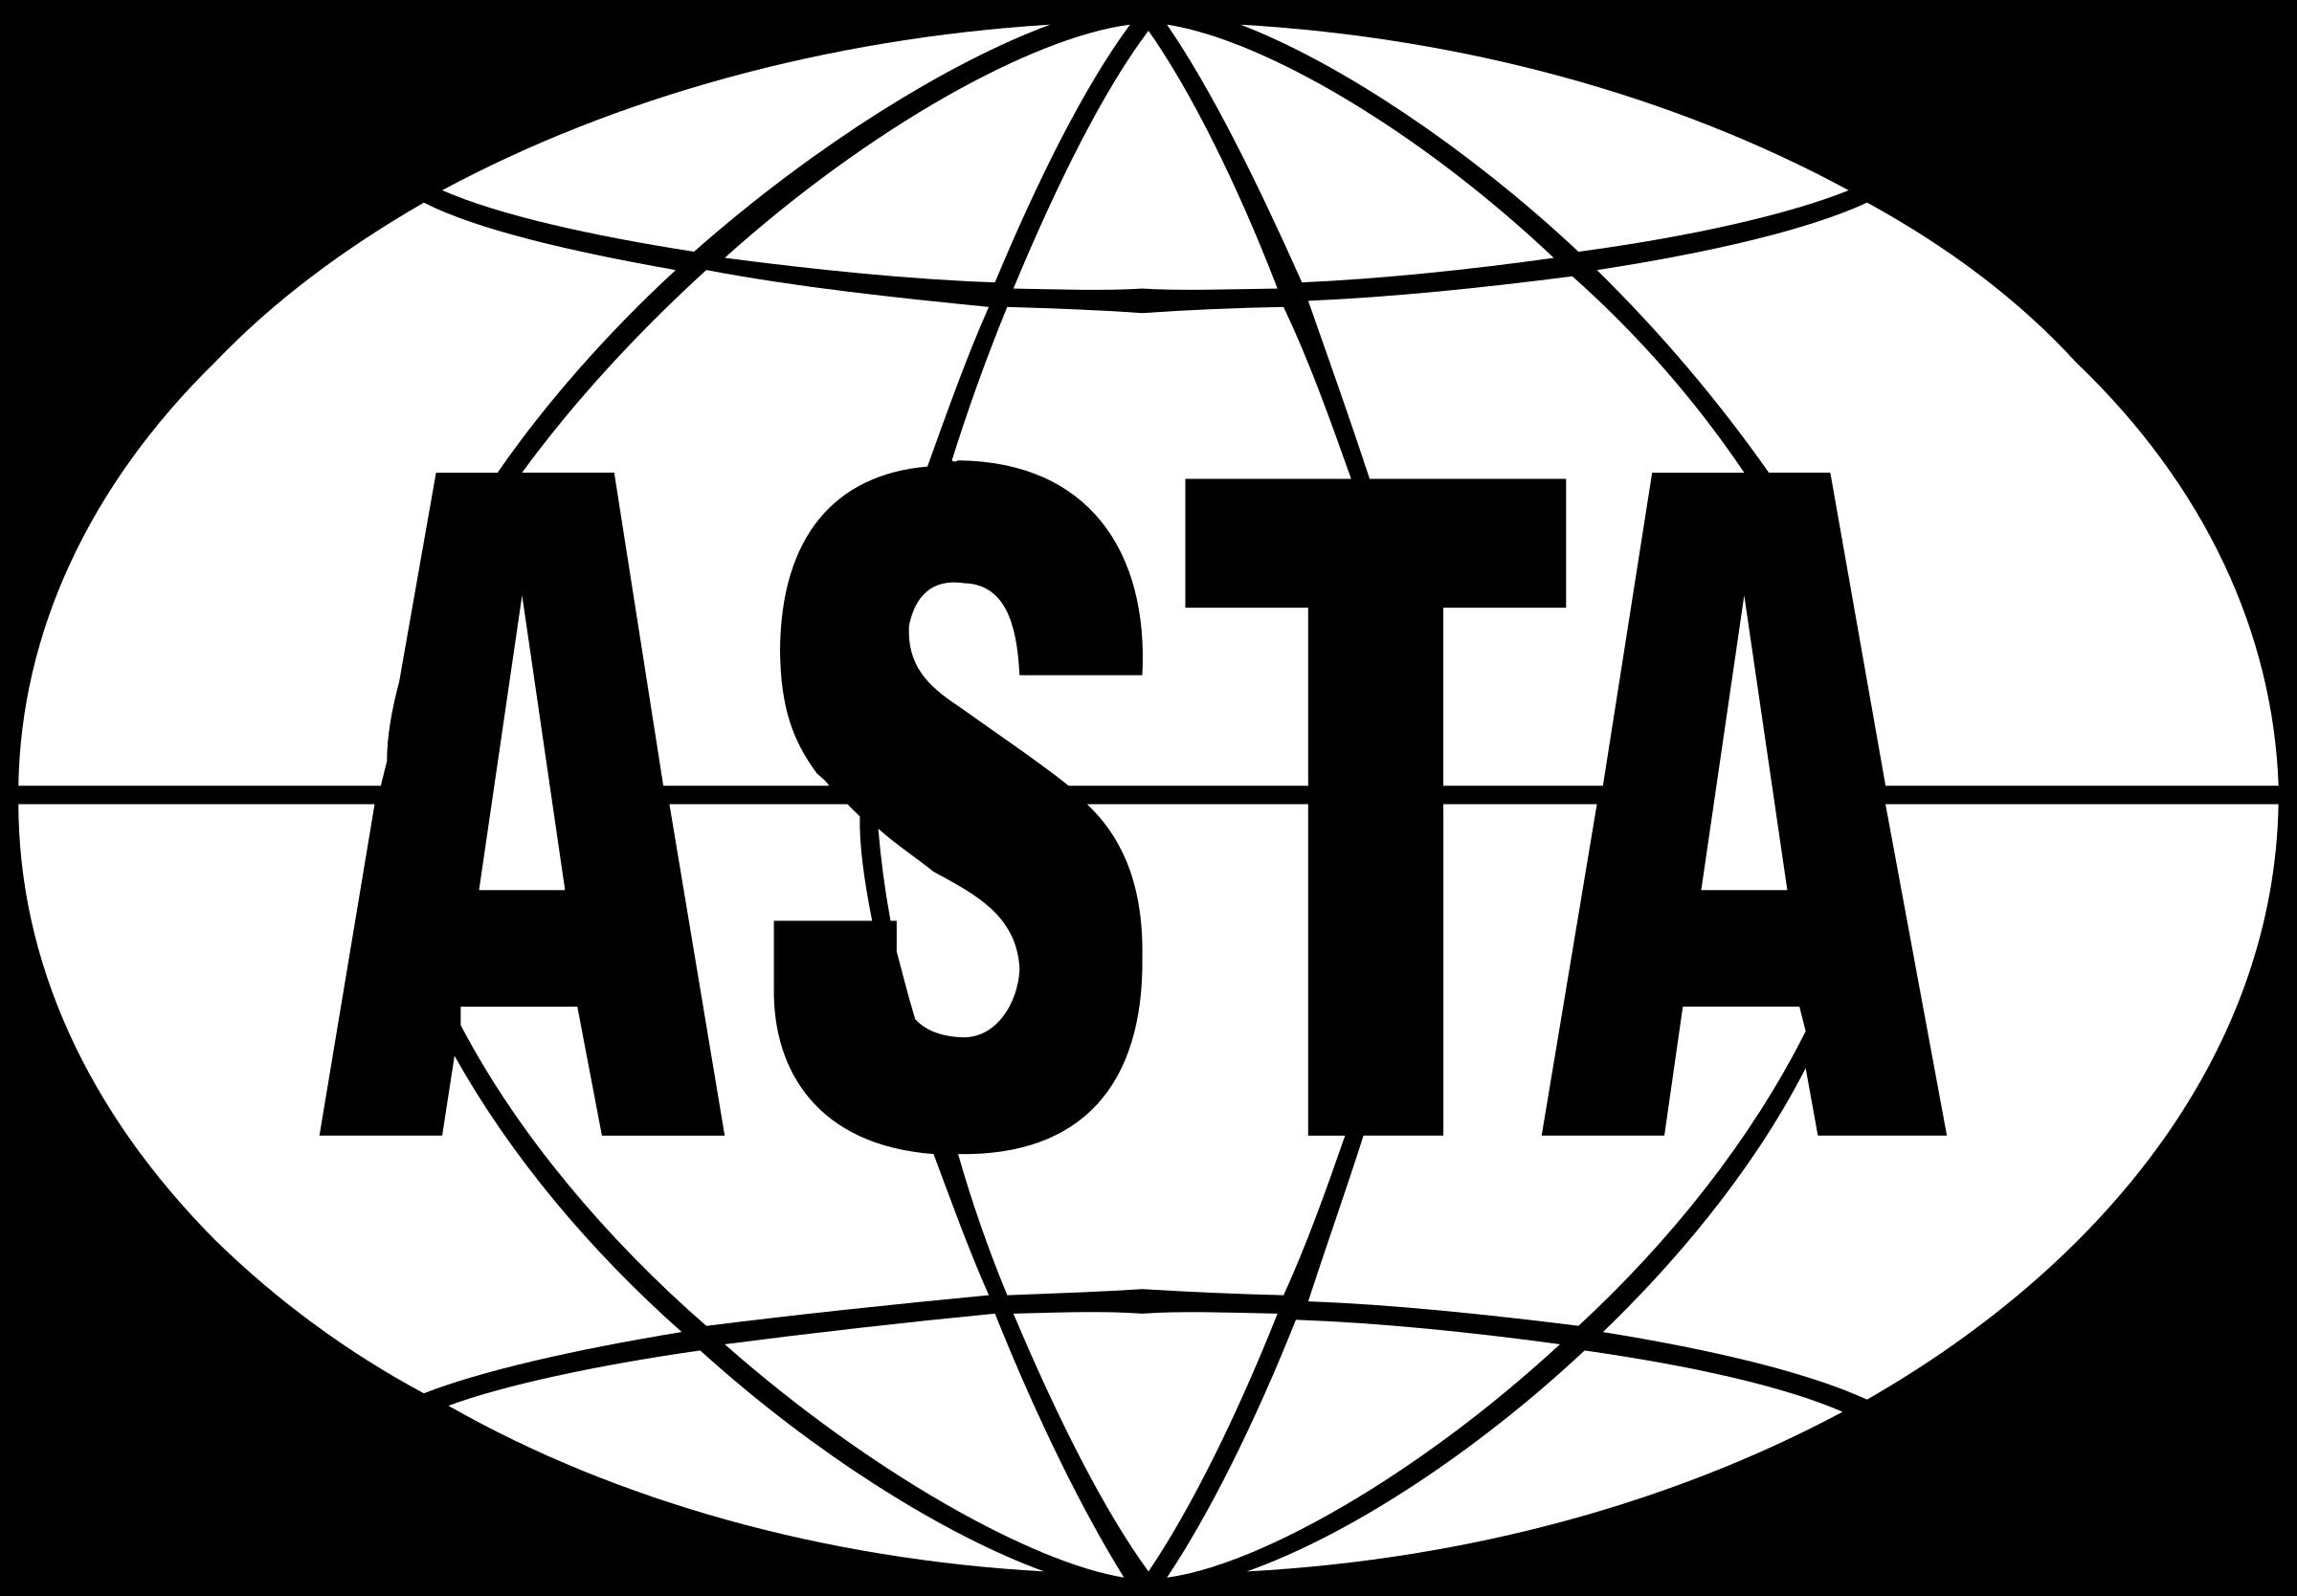 ASTA Logo PNG Transparent & SVG Vector.